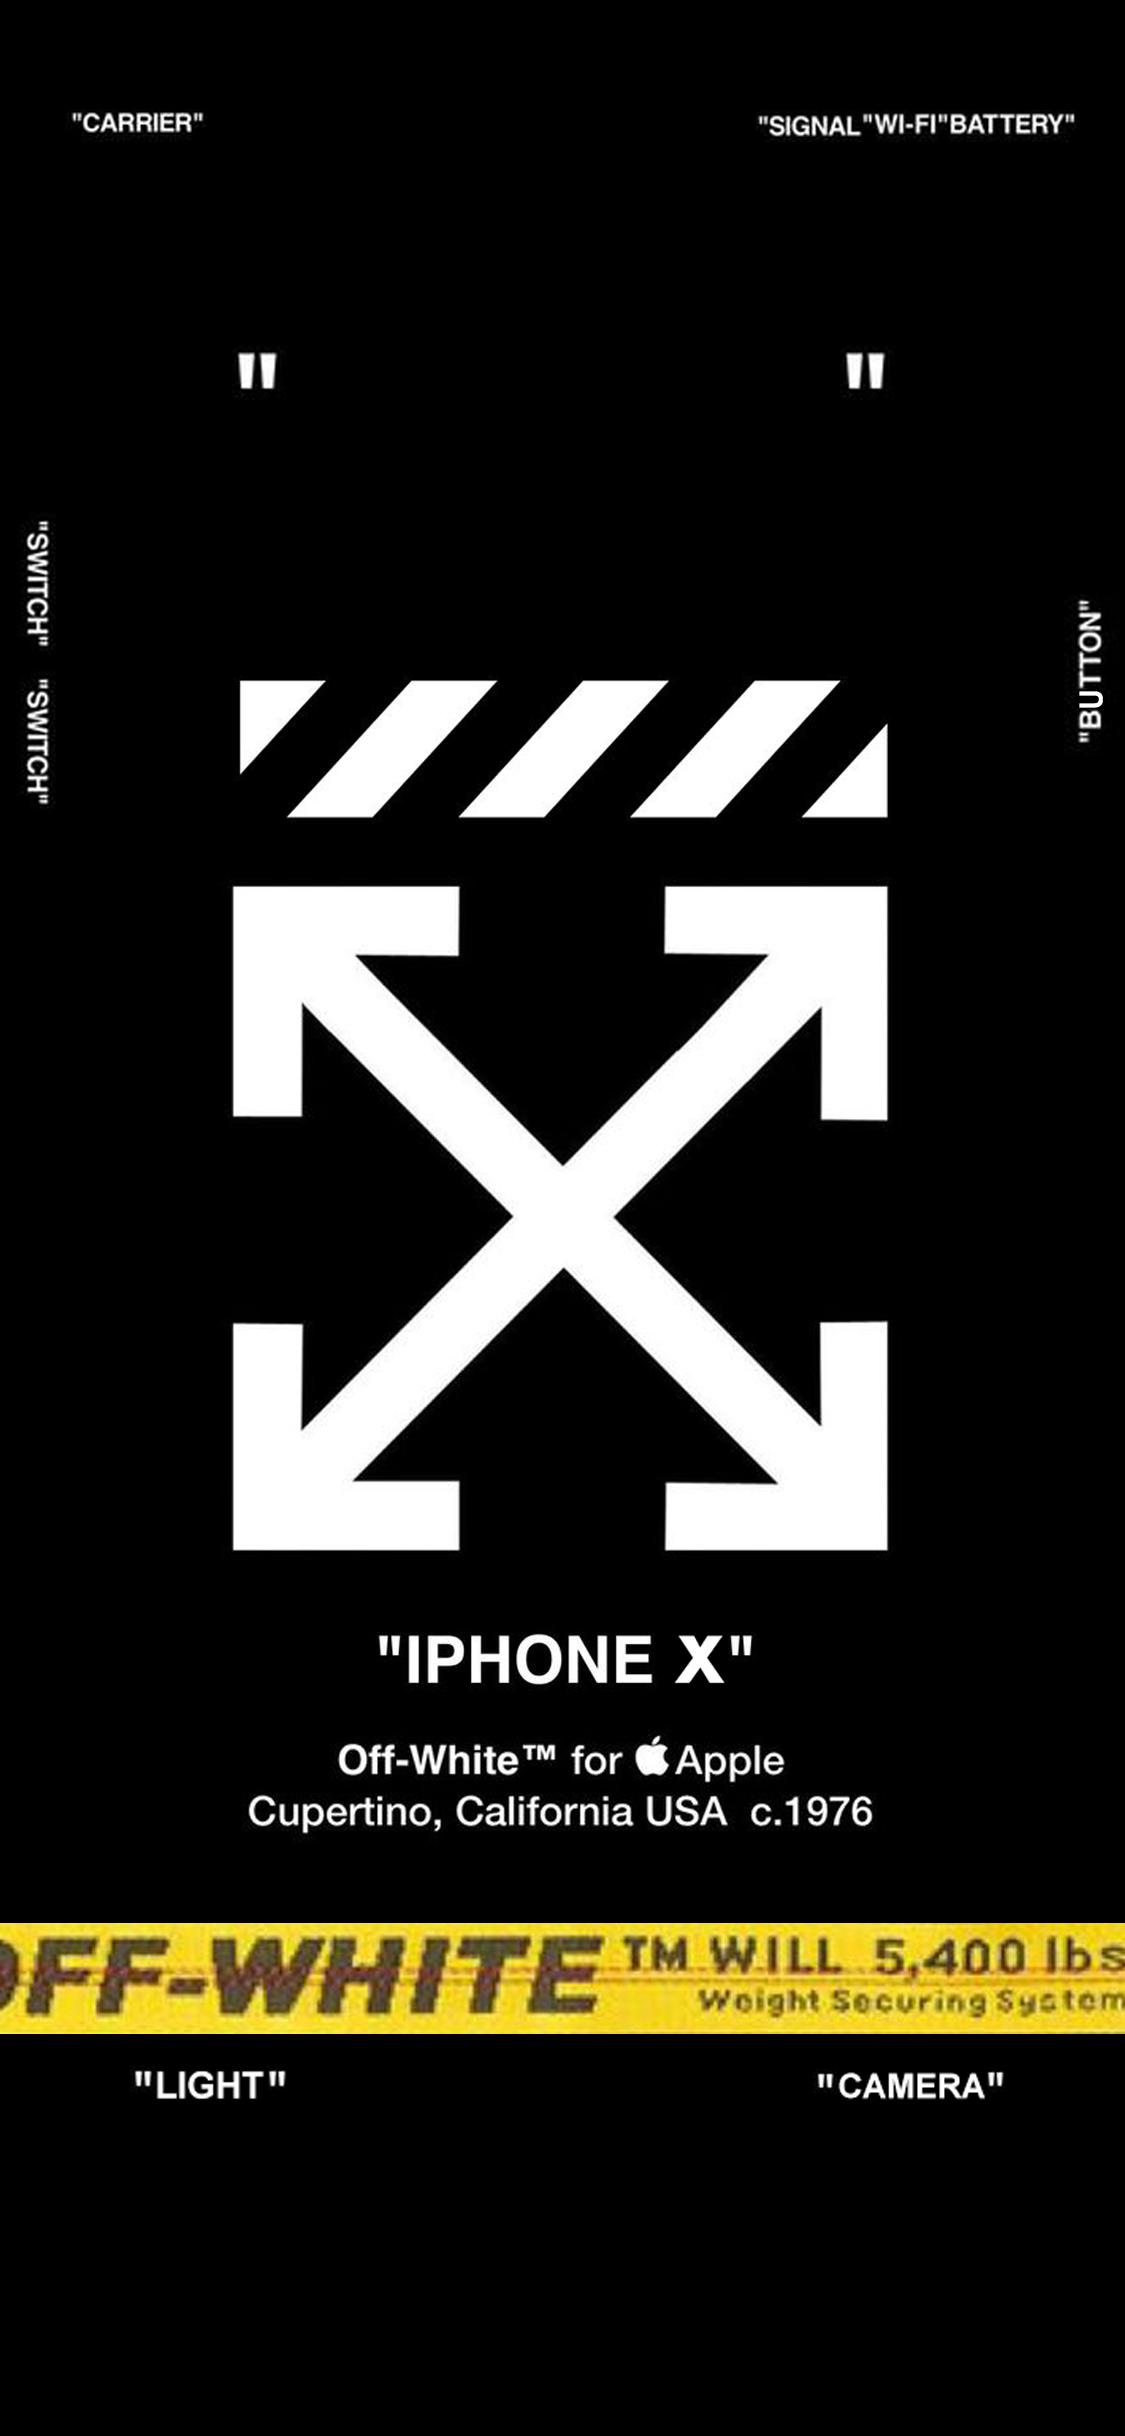 OFF WHITE LOCK SCREEN for iPhone X アップルの壁紙, Iphone 用壁紙